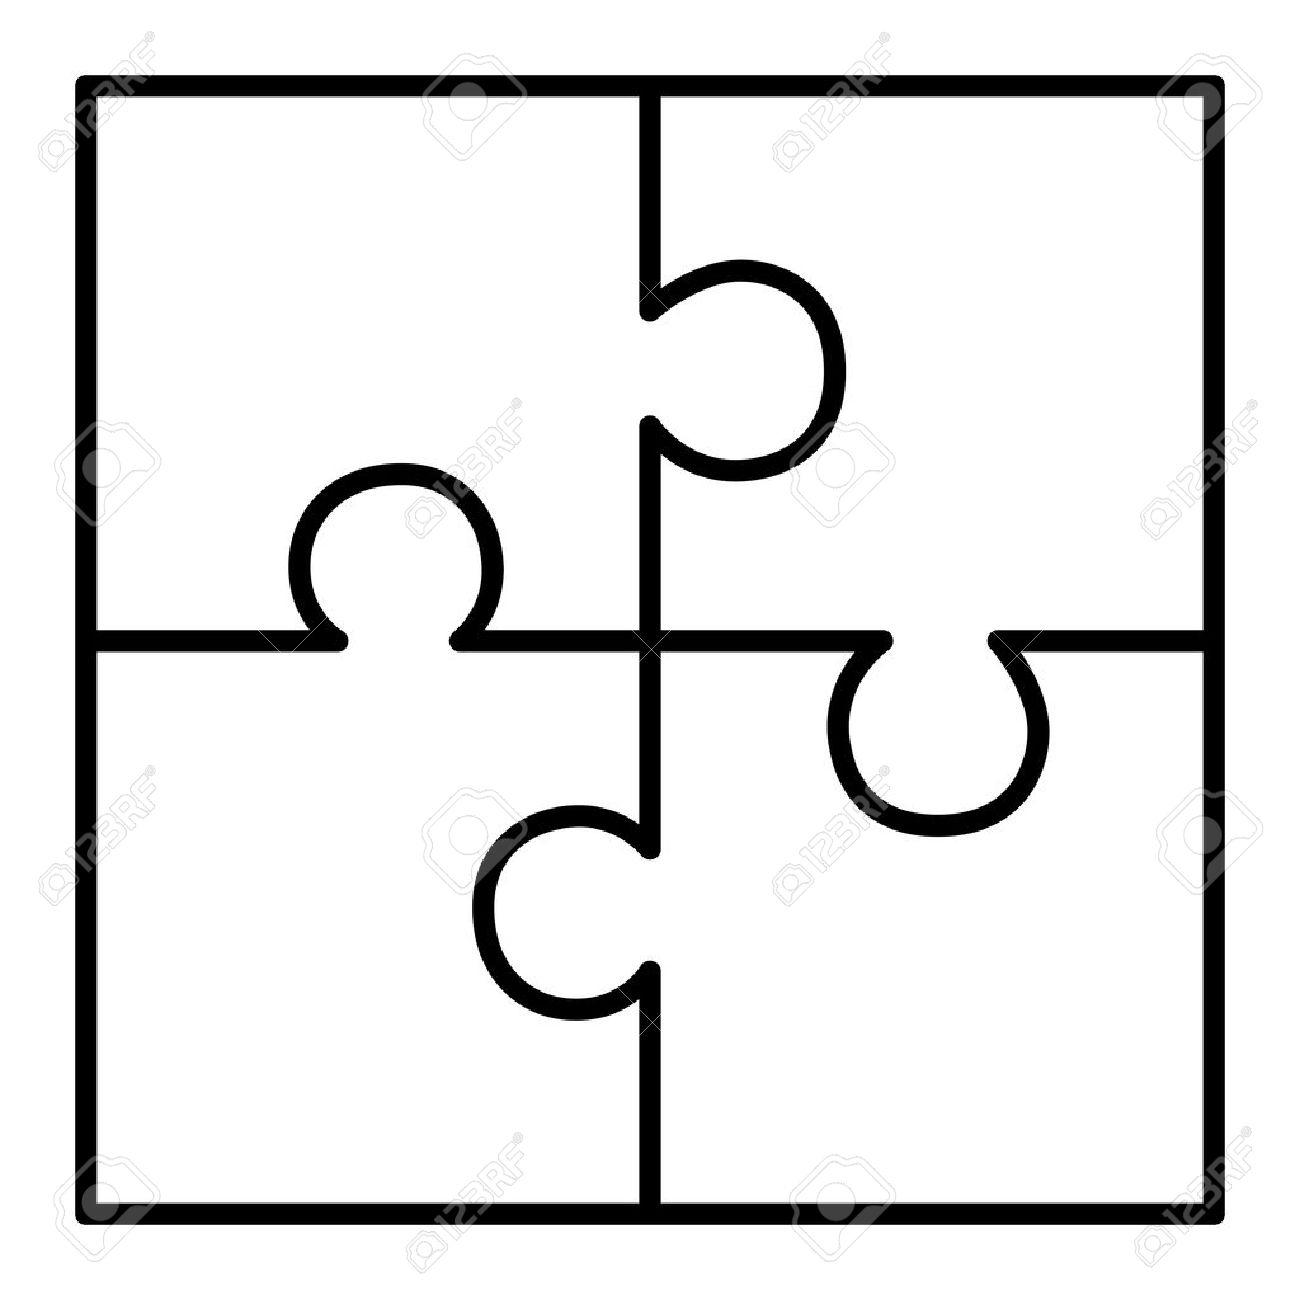 Puzzle Pieces Vector Clipart | Free Download Best Puzzle Pieces - Printable 4 Piece Puzzle Template